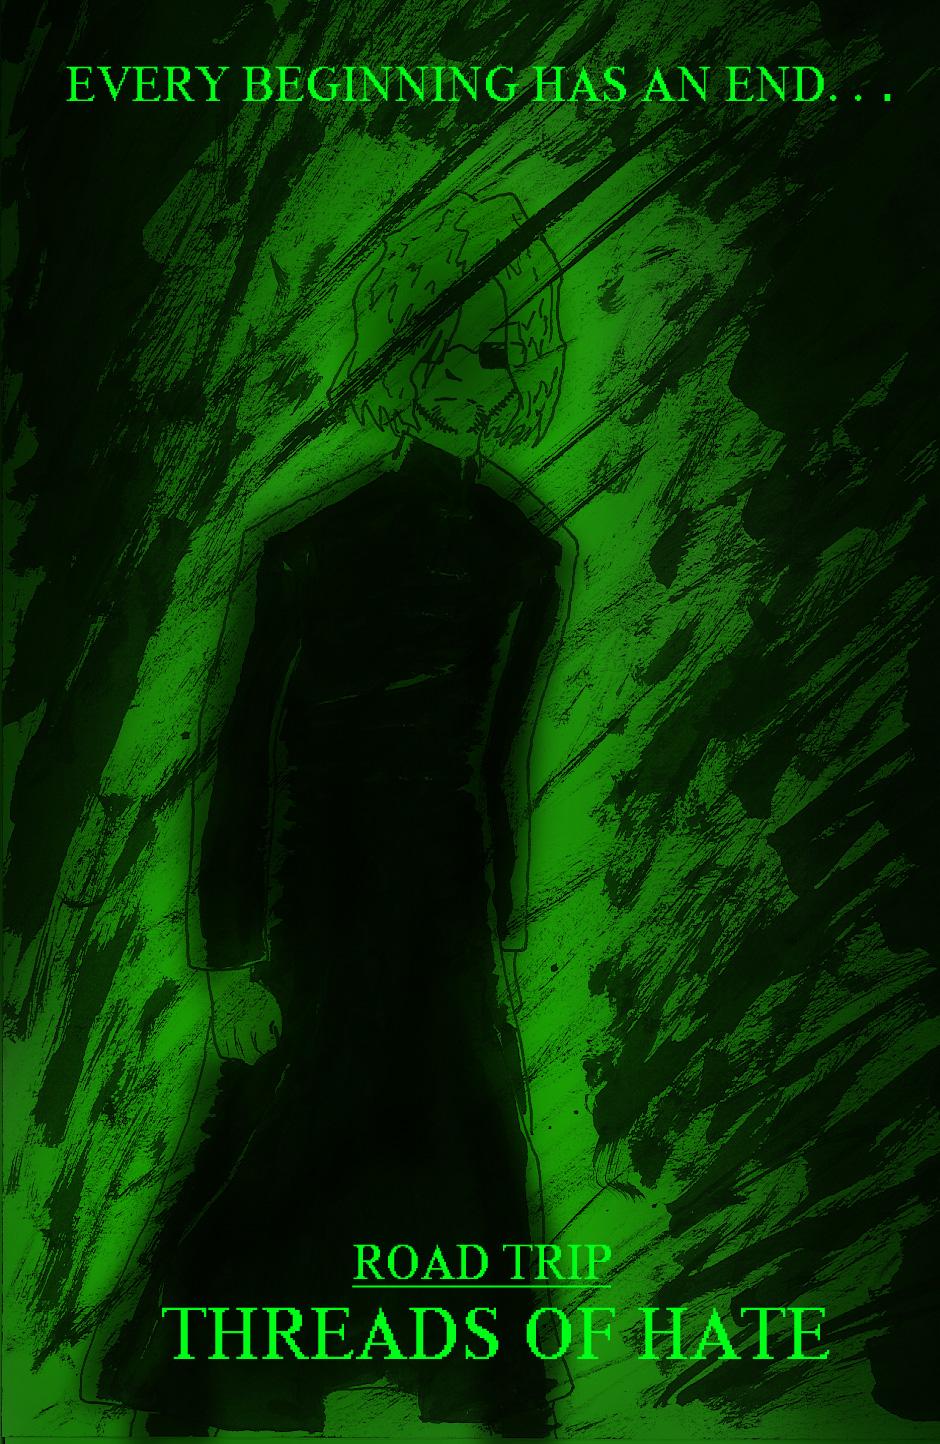 Full-size Matrix Poster by godmoder